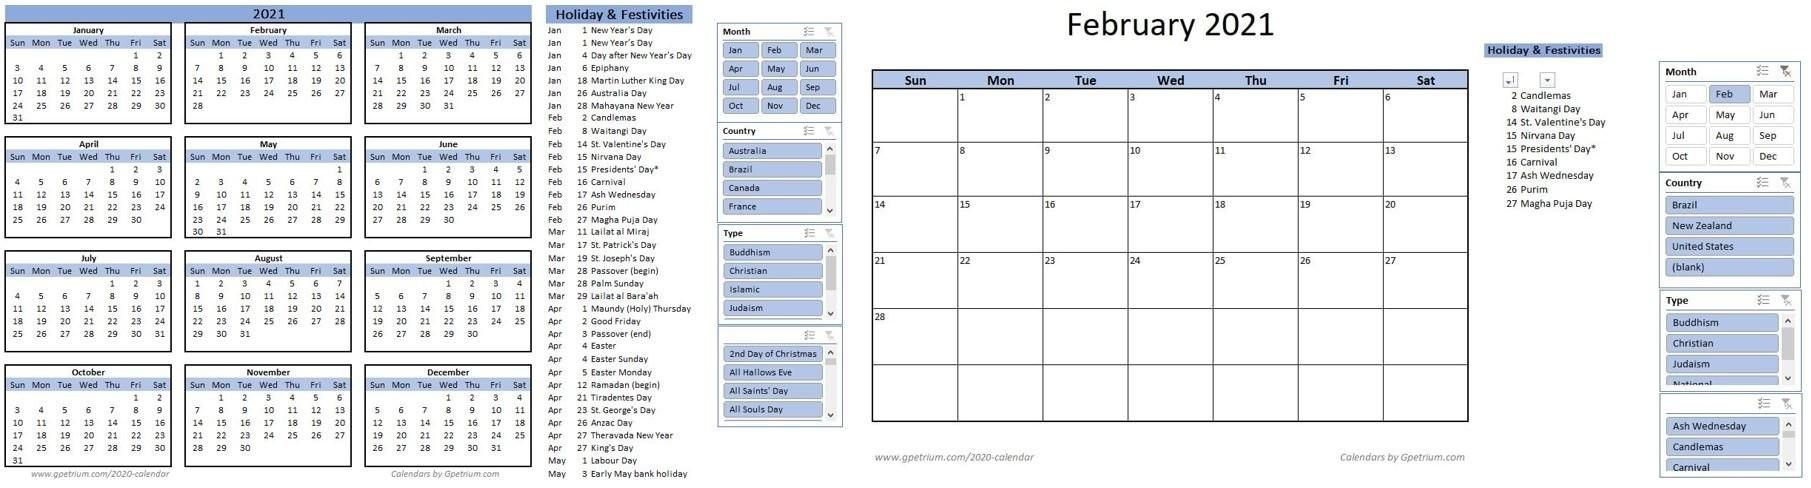 2021 Vacation Schedule Template Excel | Calendar Template ...